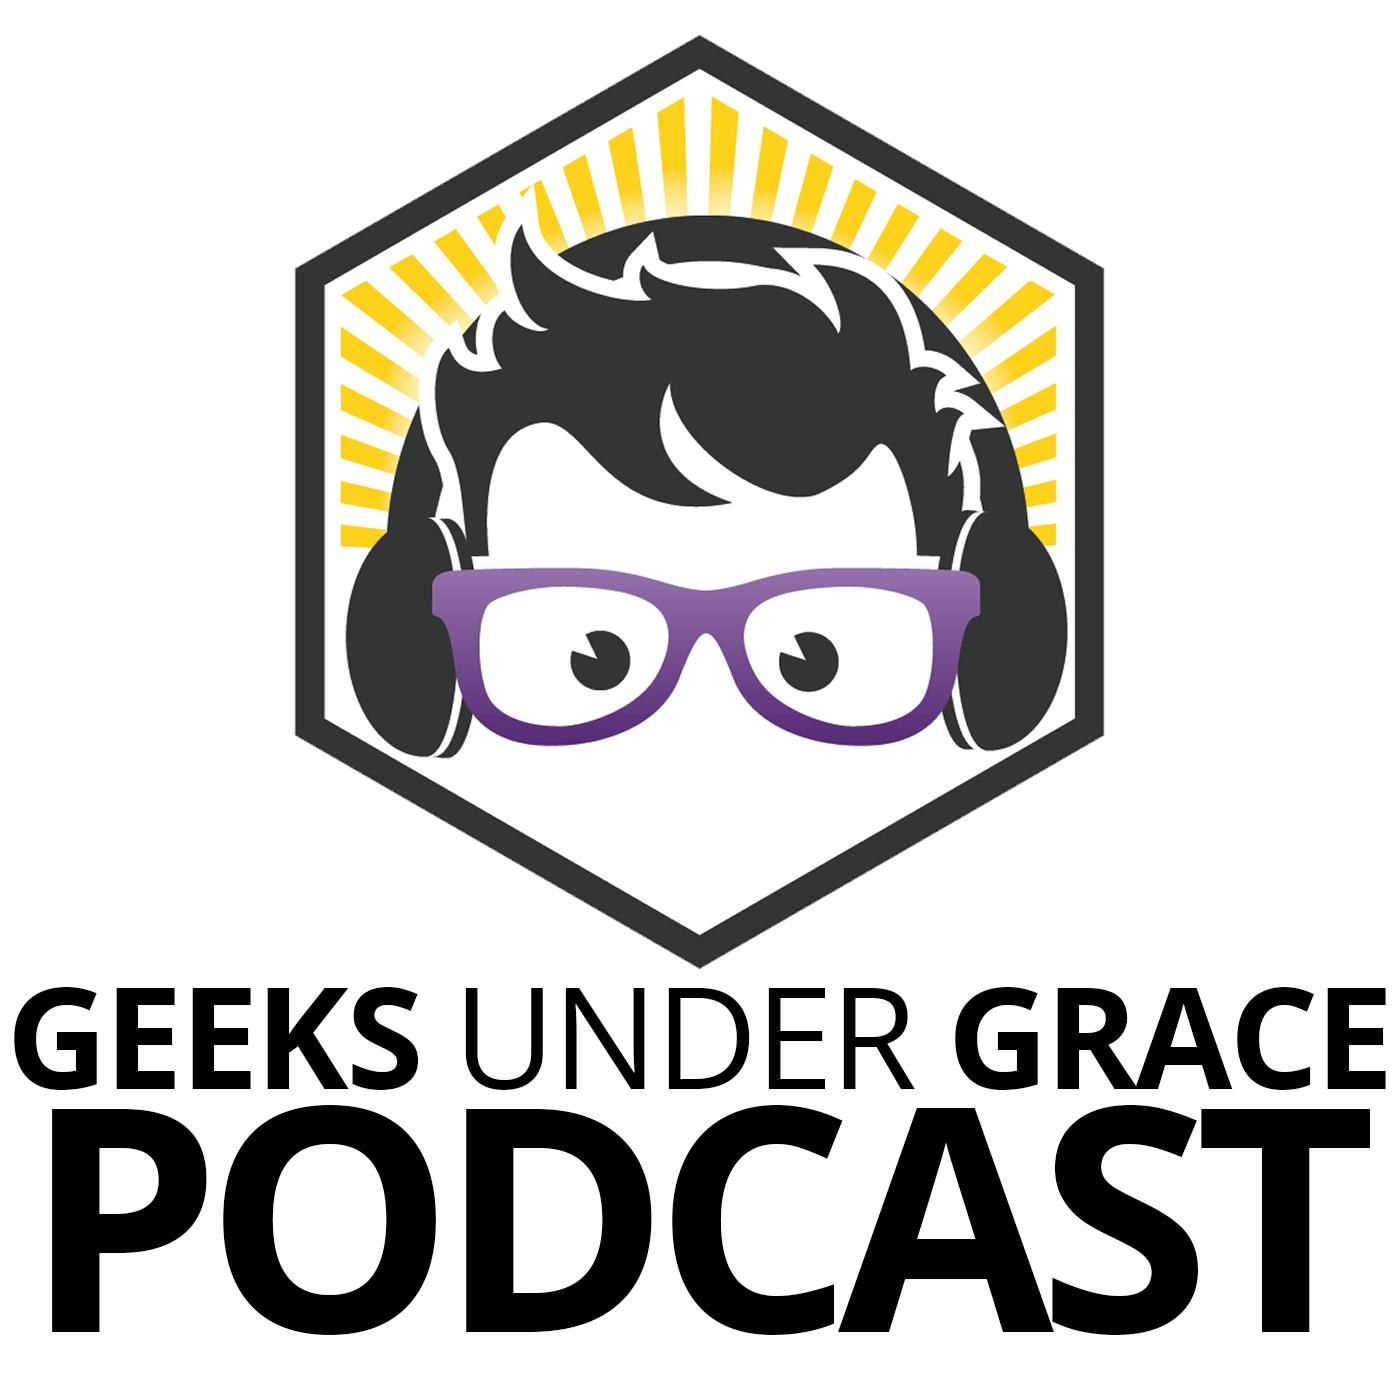 Geeks Under Grace Podcast